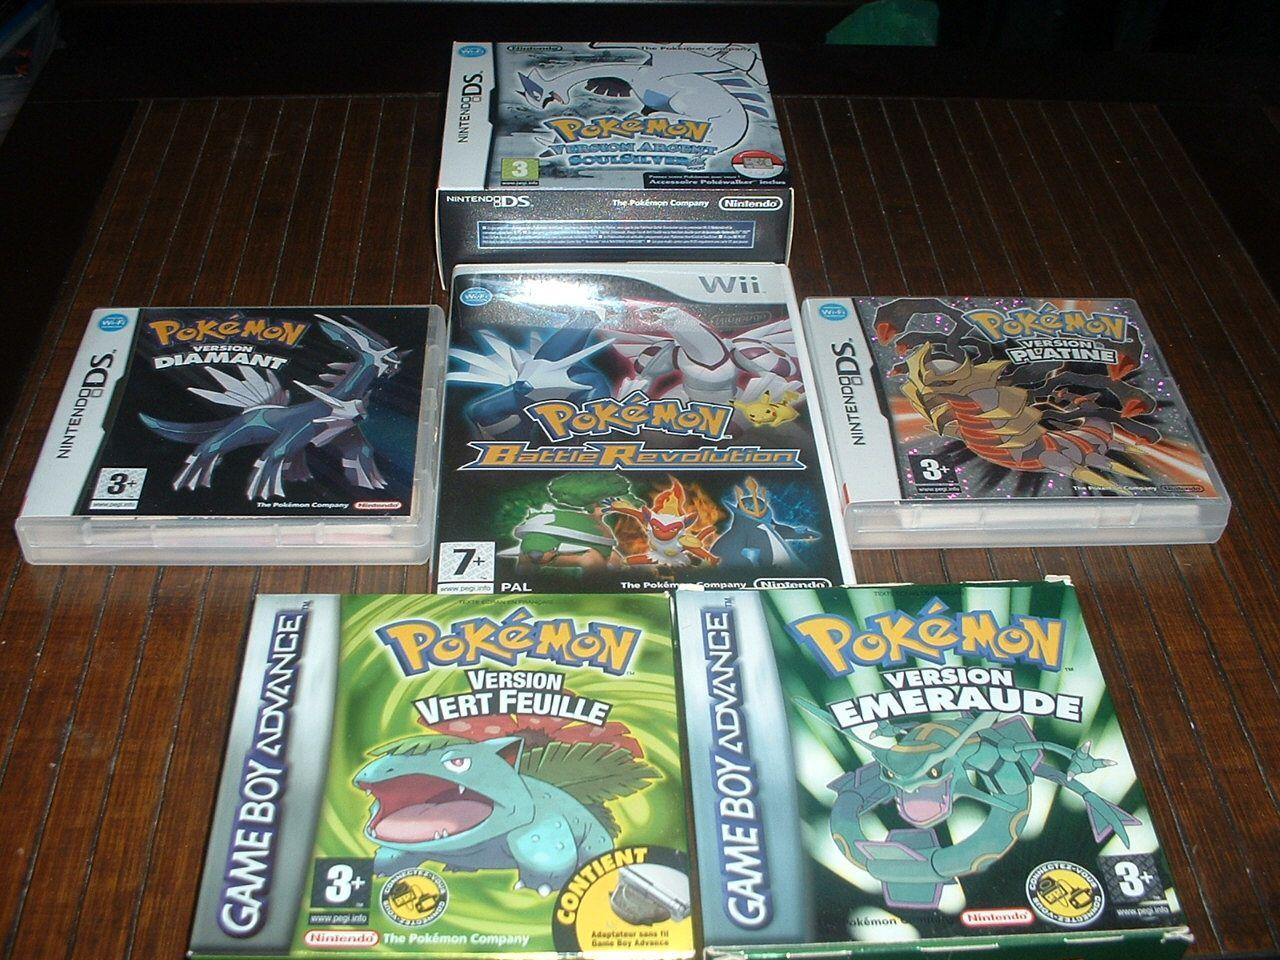 Jeux de pokemon platine - Jeux info pokemon ...